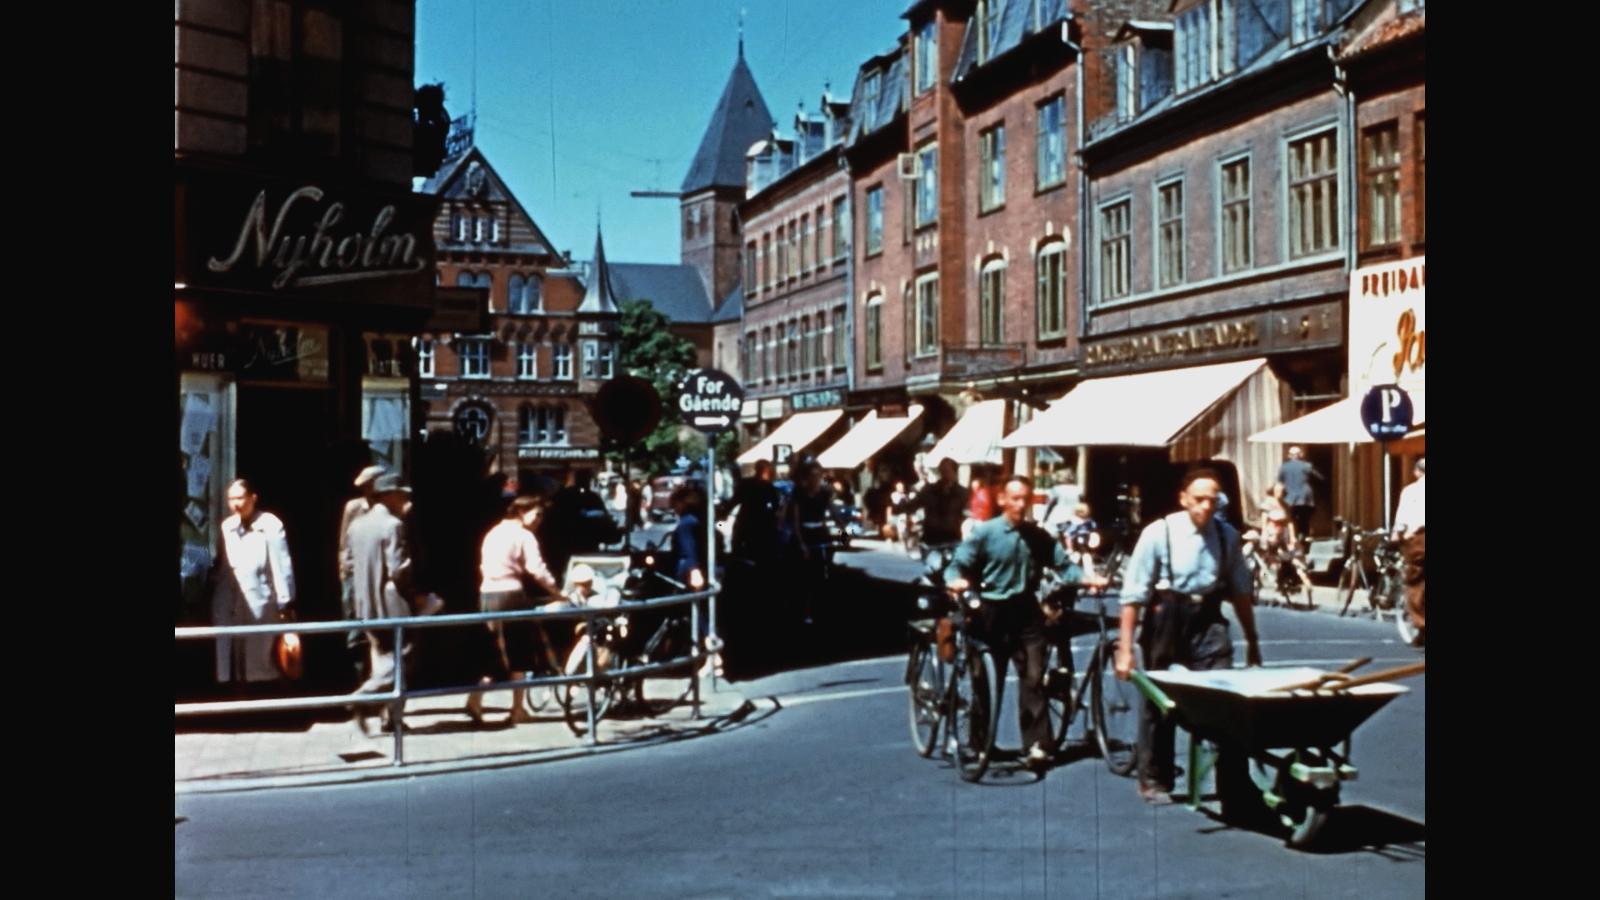 Hallefilmen – Vor egen by: Historisk Tirsdags TV